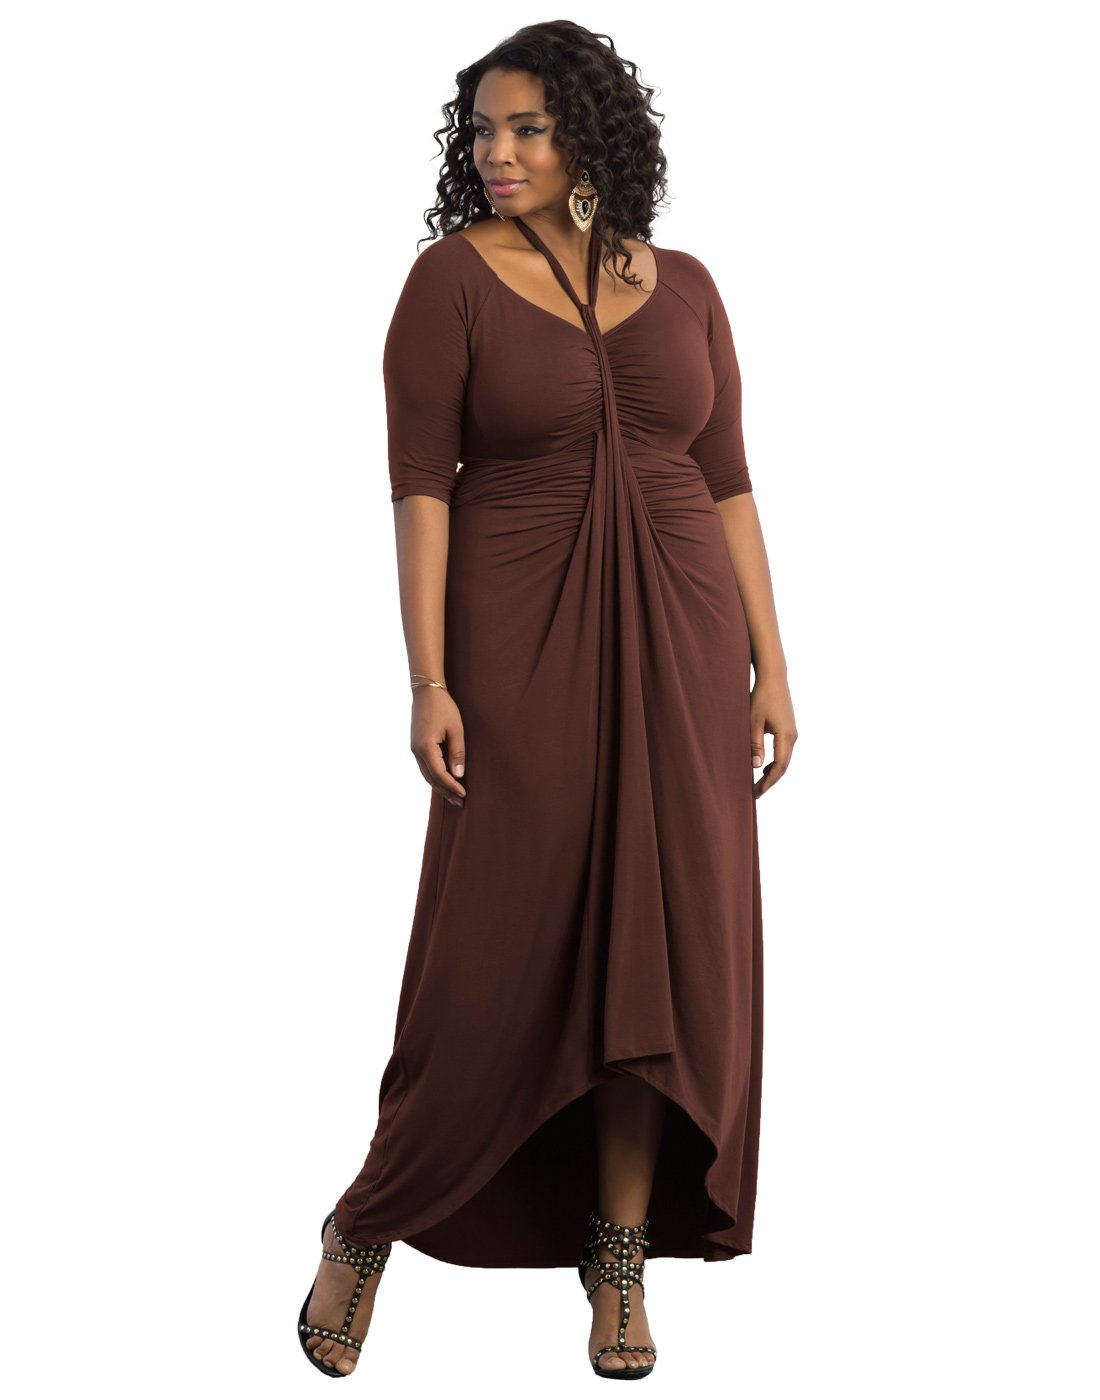 Kiyonna Women's Plus Size Divine Draped Maxi Dress 1X Mahogany